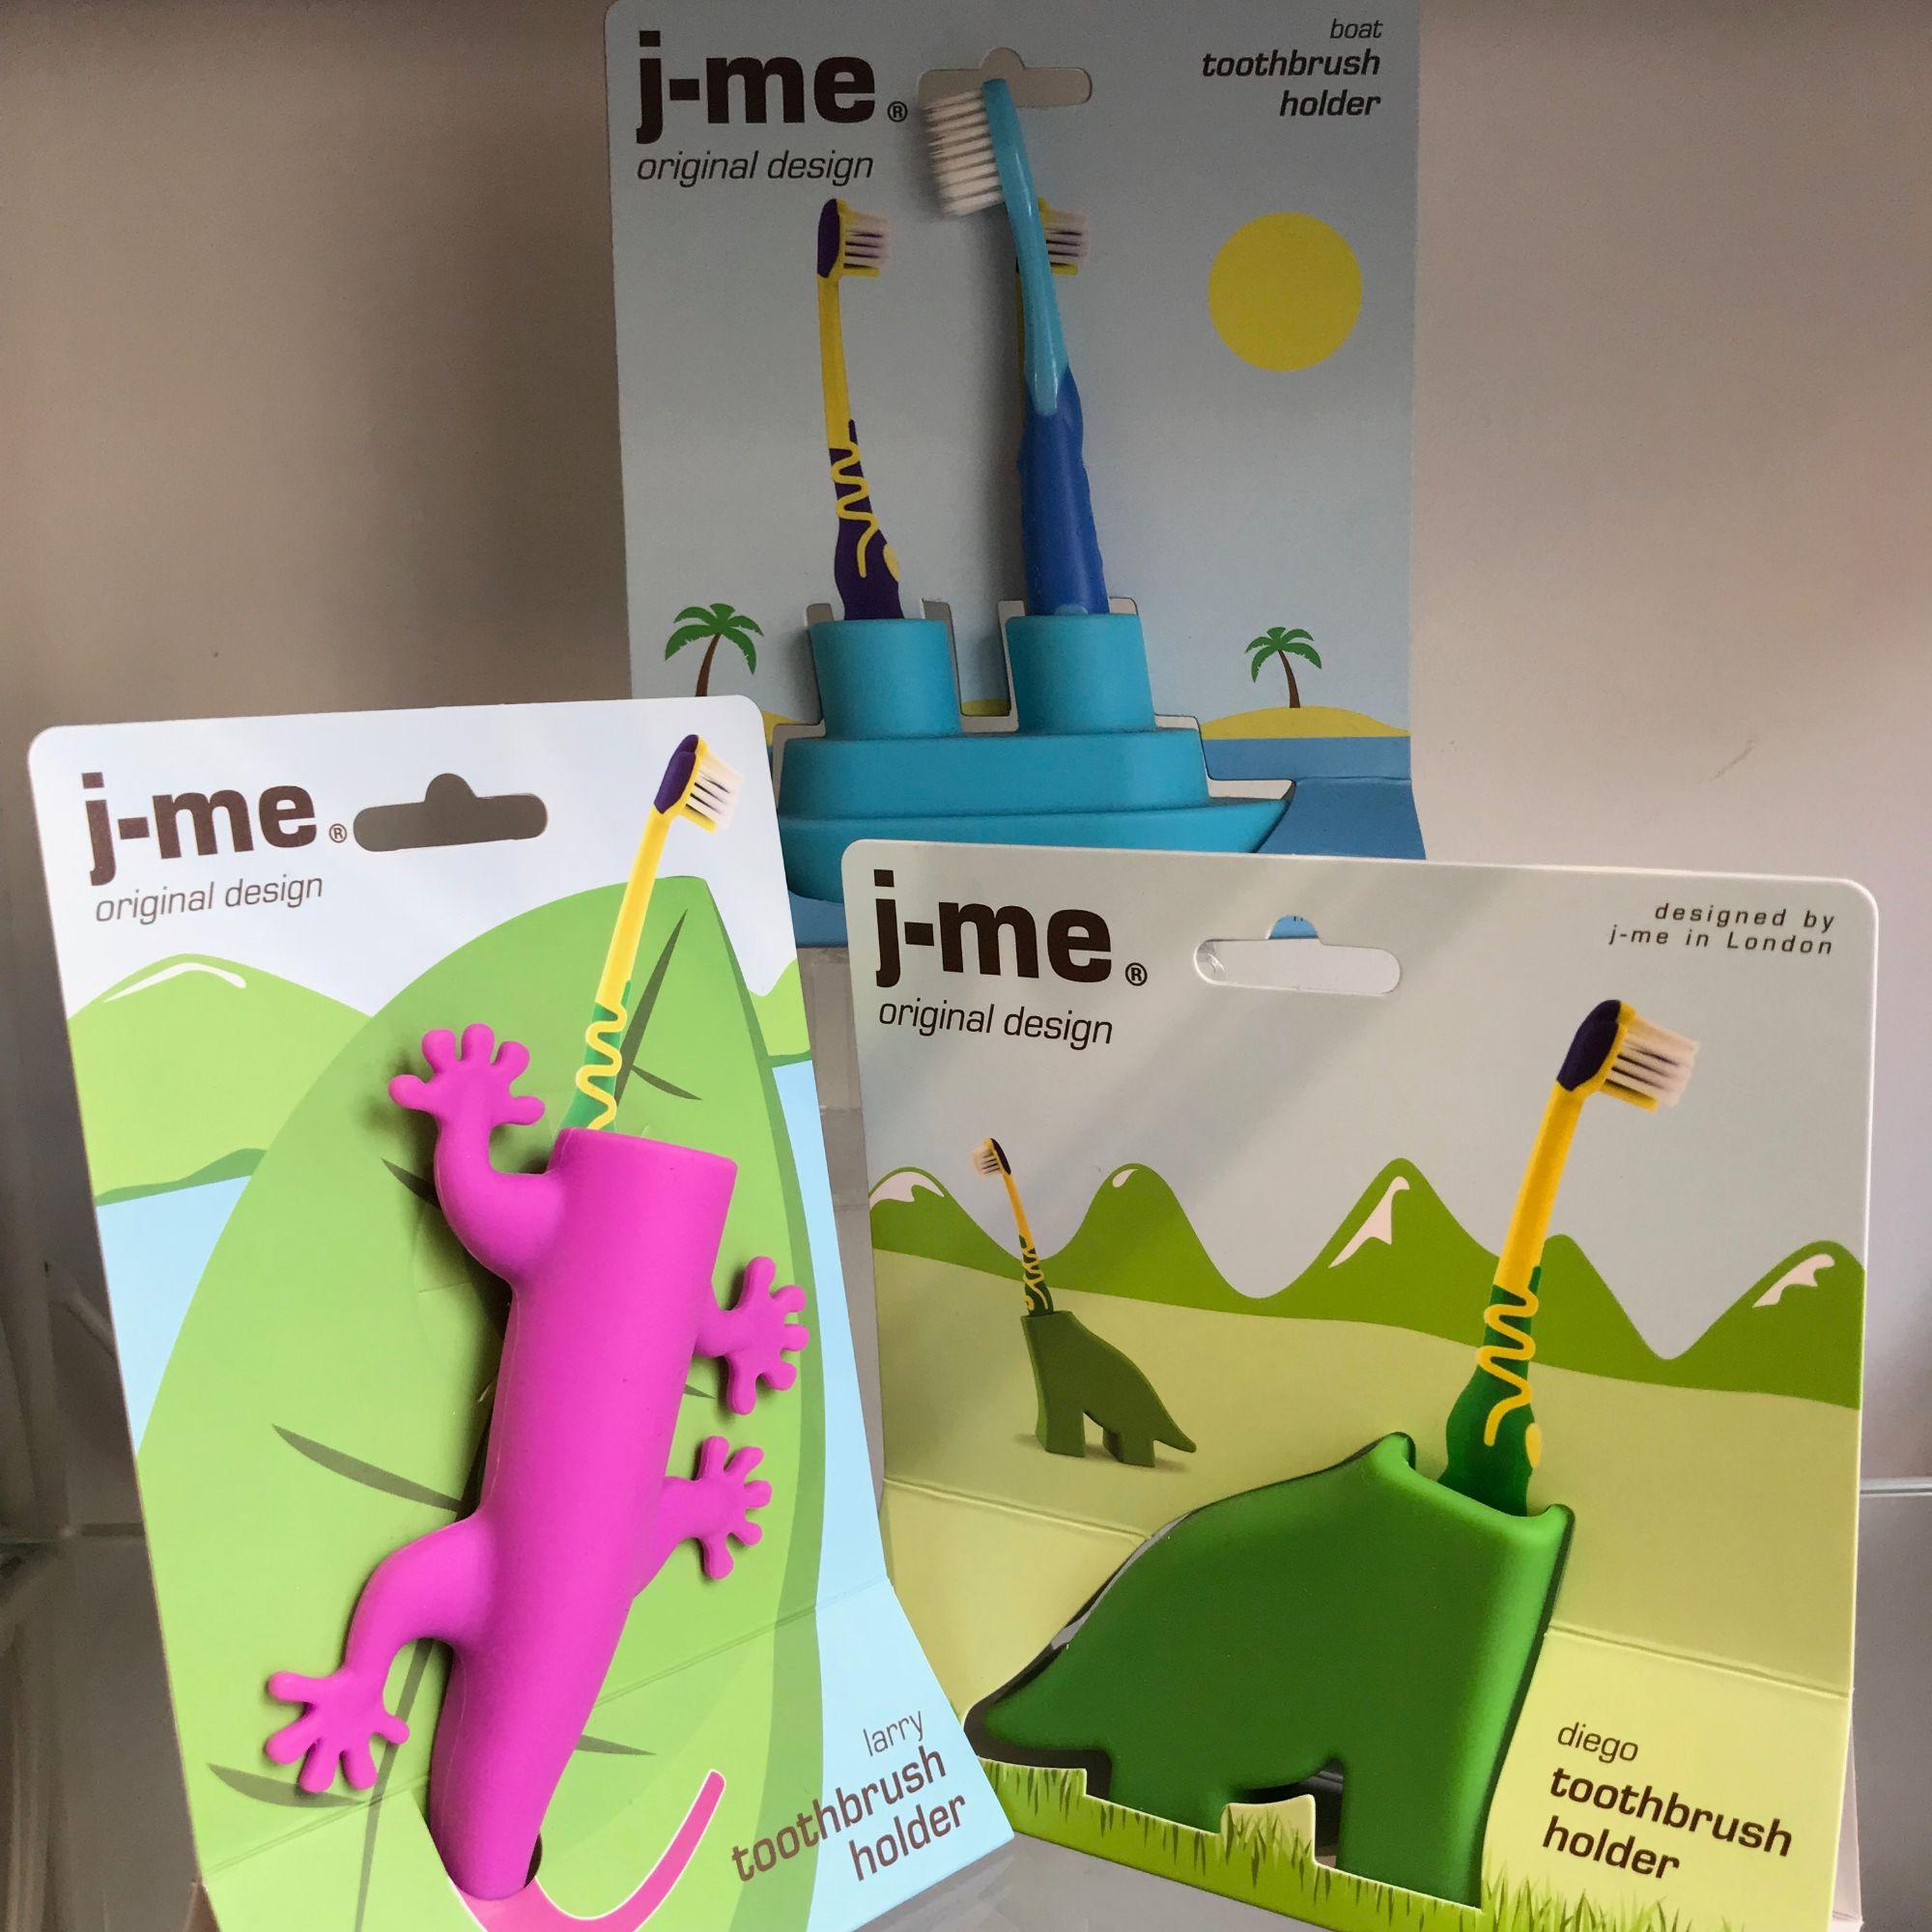 J-me have some brilliant design-led gifts suitable for children